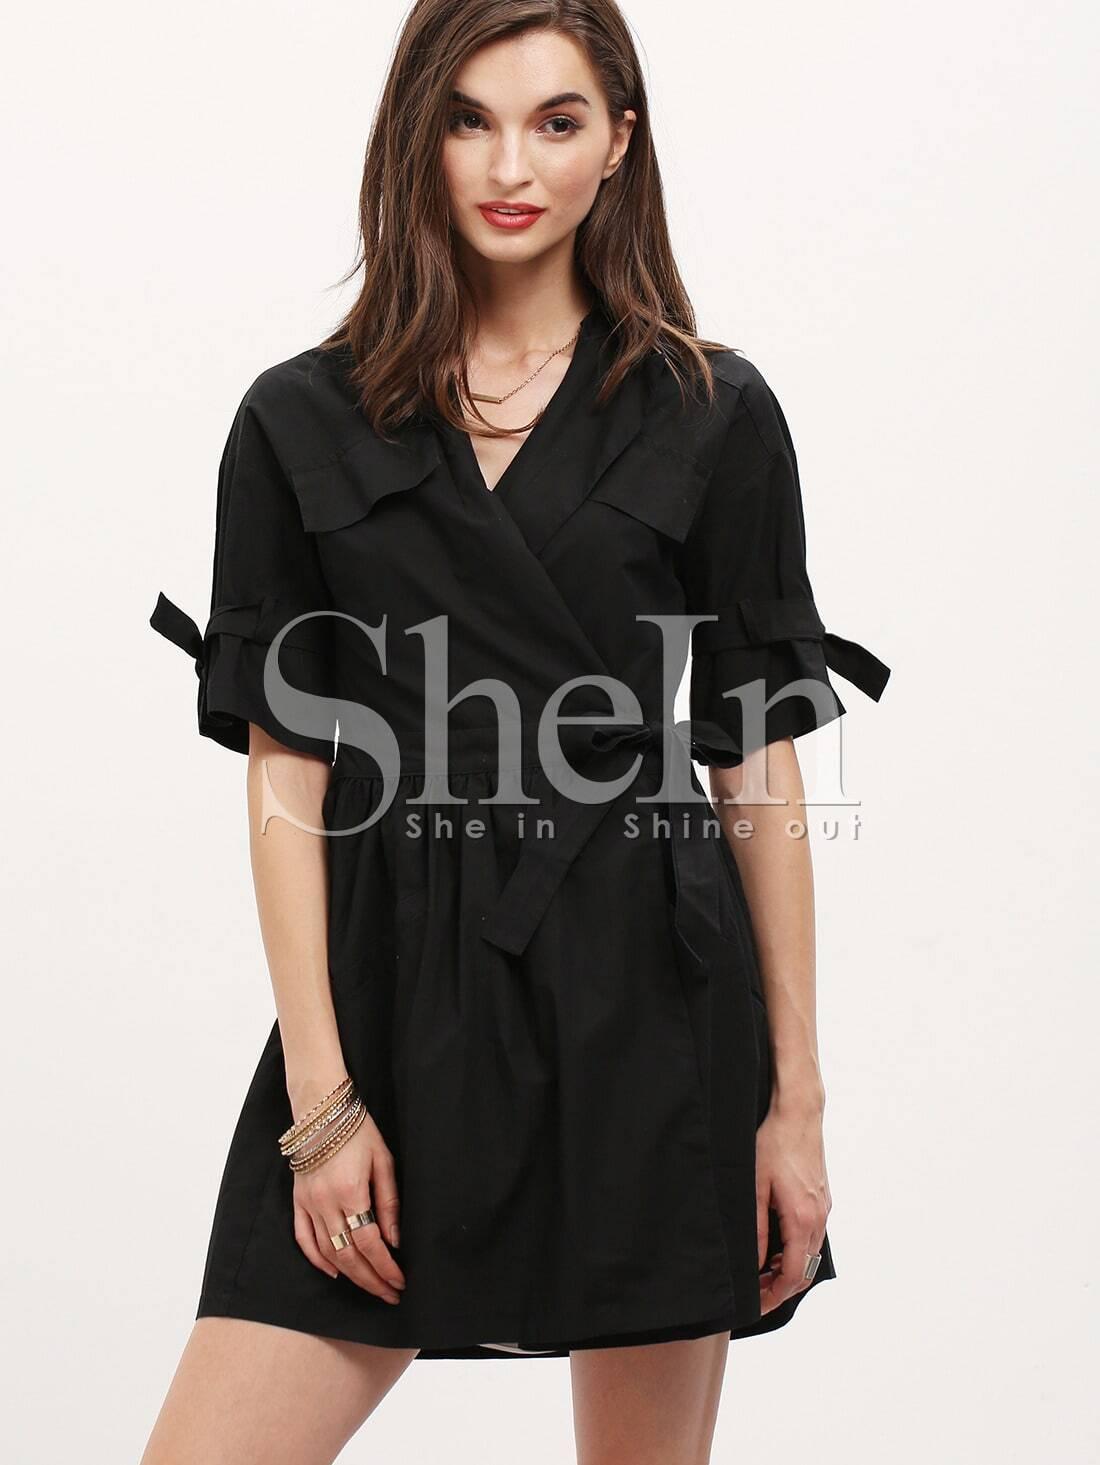 Black Half Sleeve Pockets Trench CoatBlack Half Sleeve Pockets Trench Coat<br><br>color: Black<br>size: L